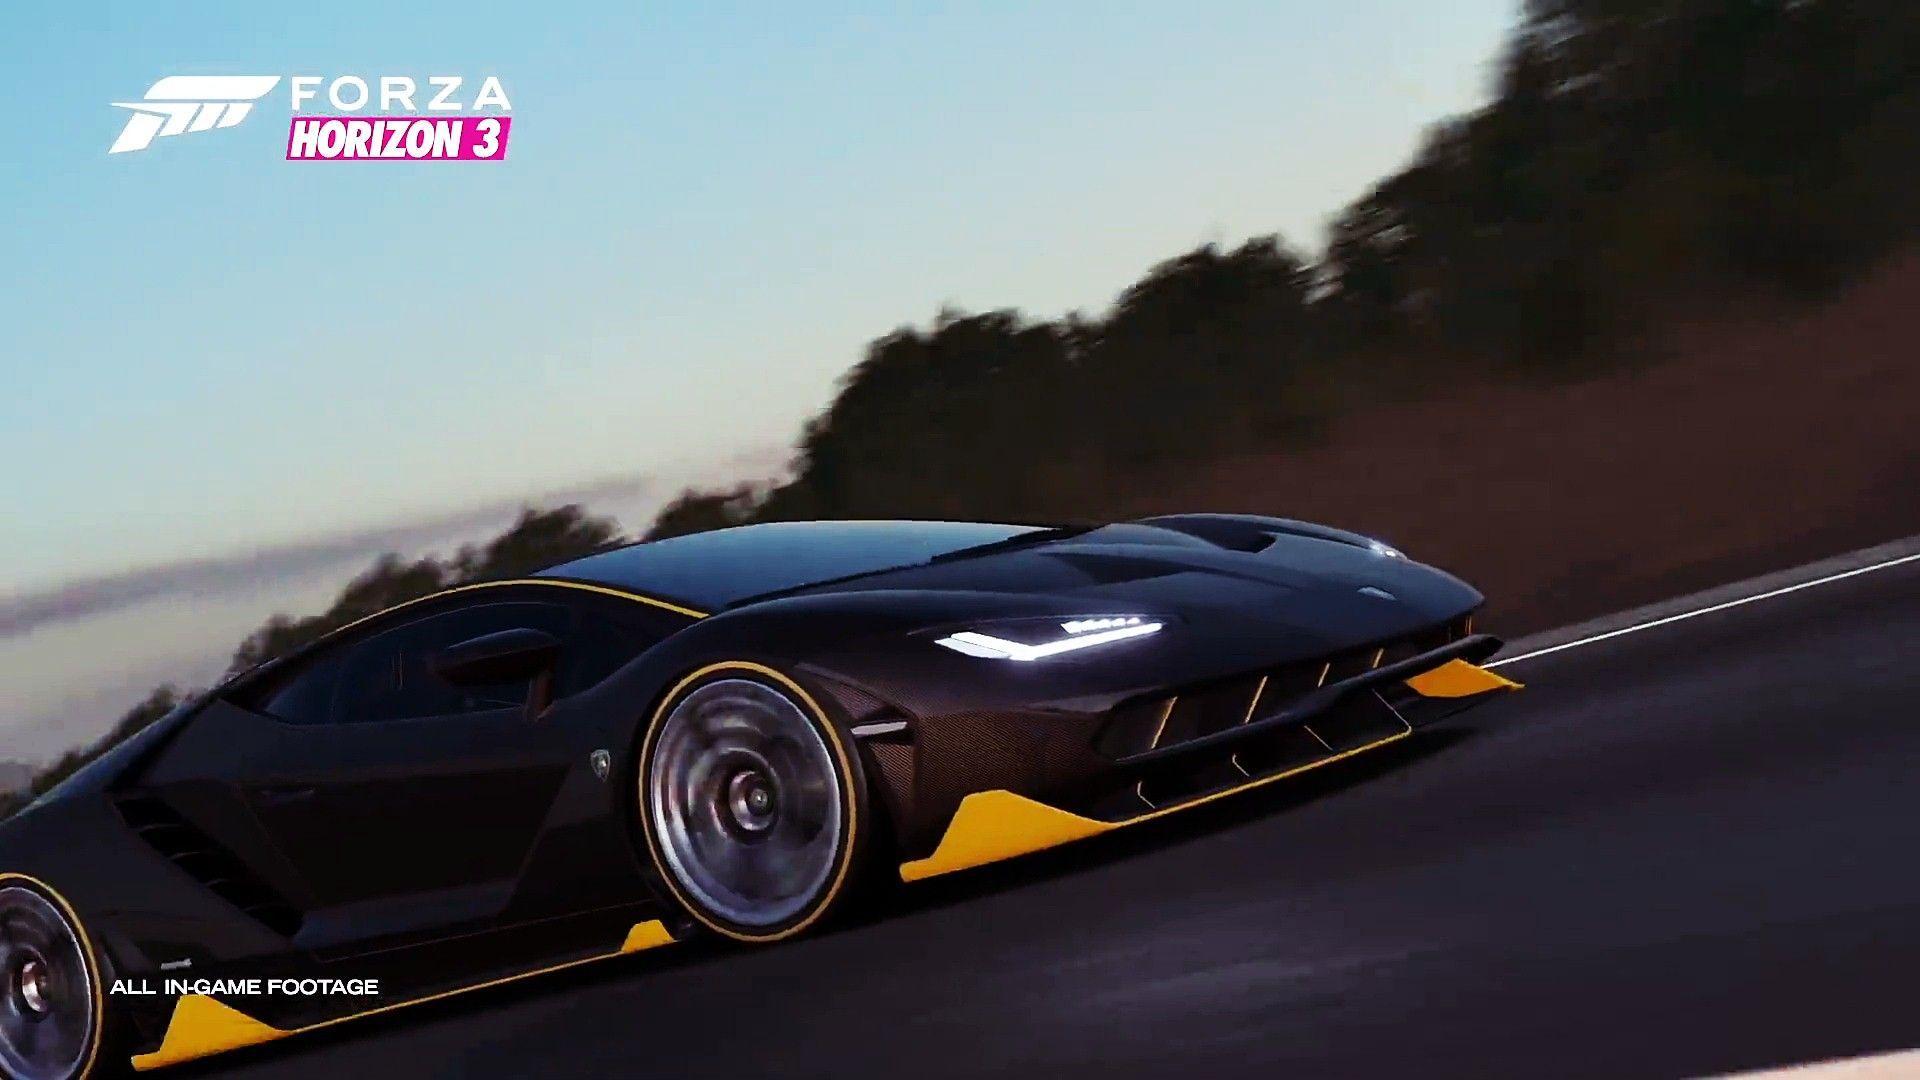 Forza Horizon 3 Background: Lamborghini Centenario Wallpapers